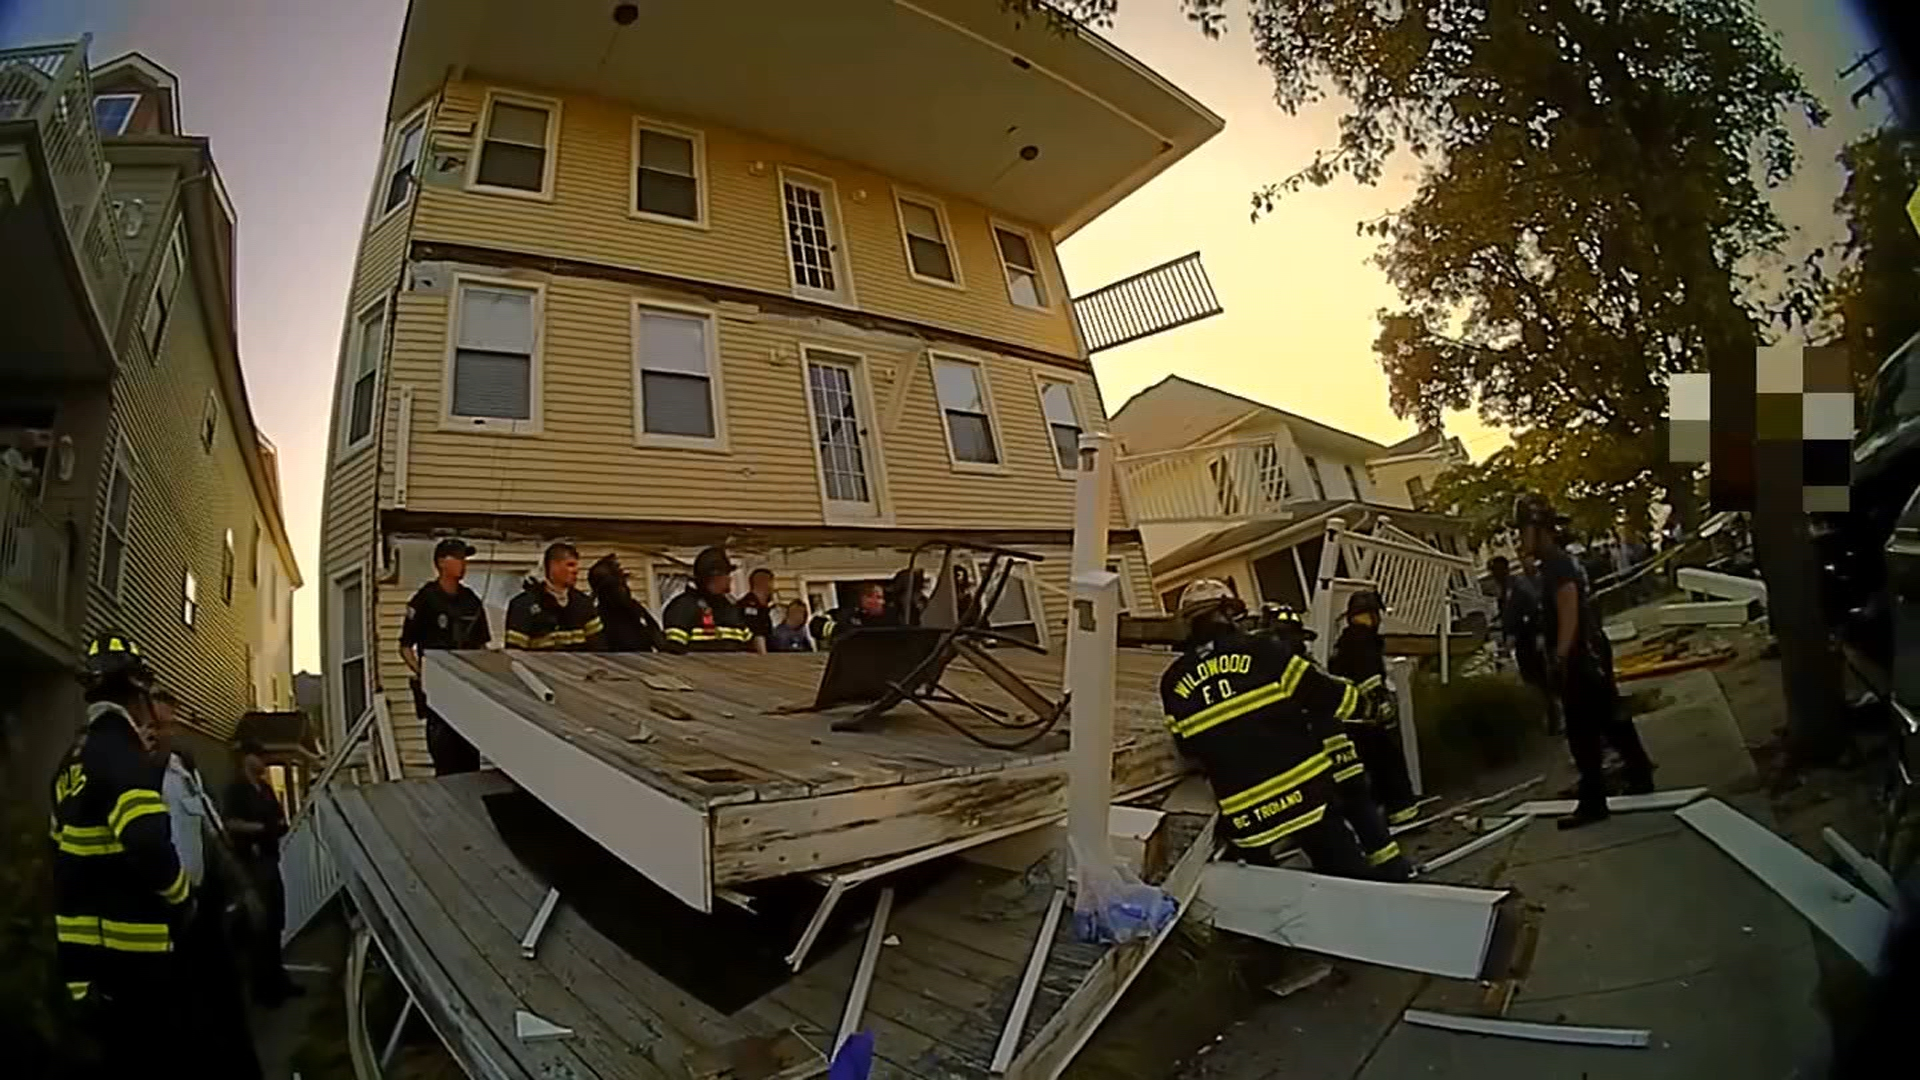 New Videos Show NJ Deck Collapse, Frantic Rescue Effort